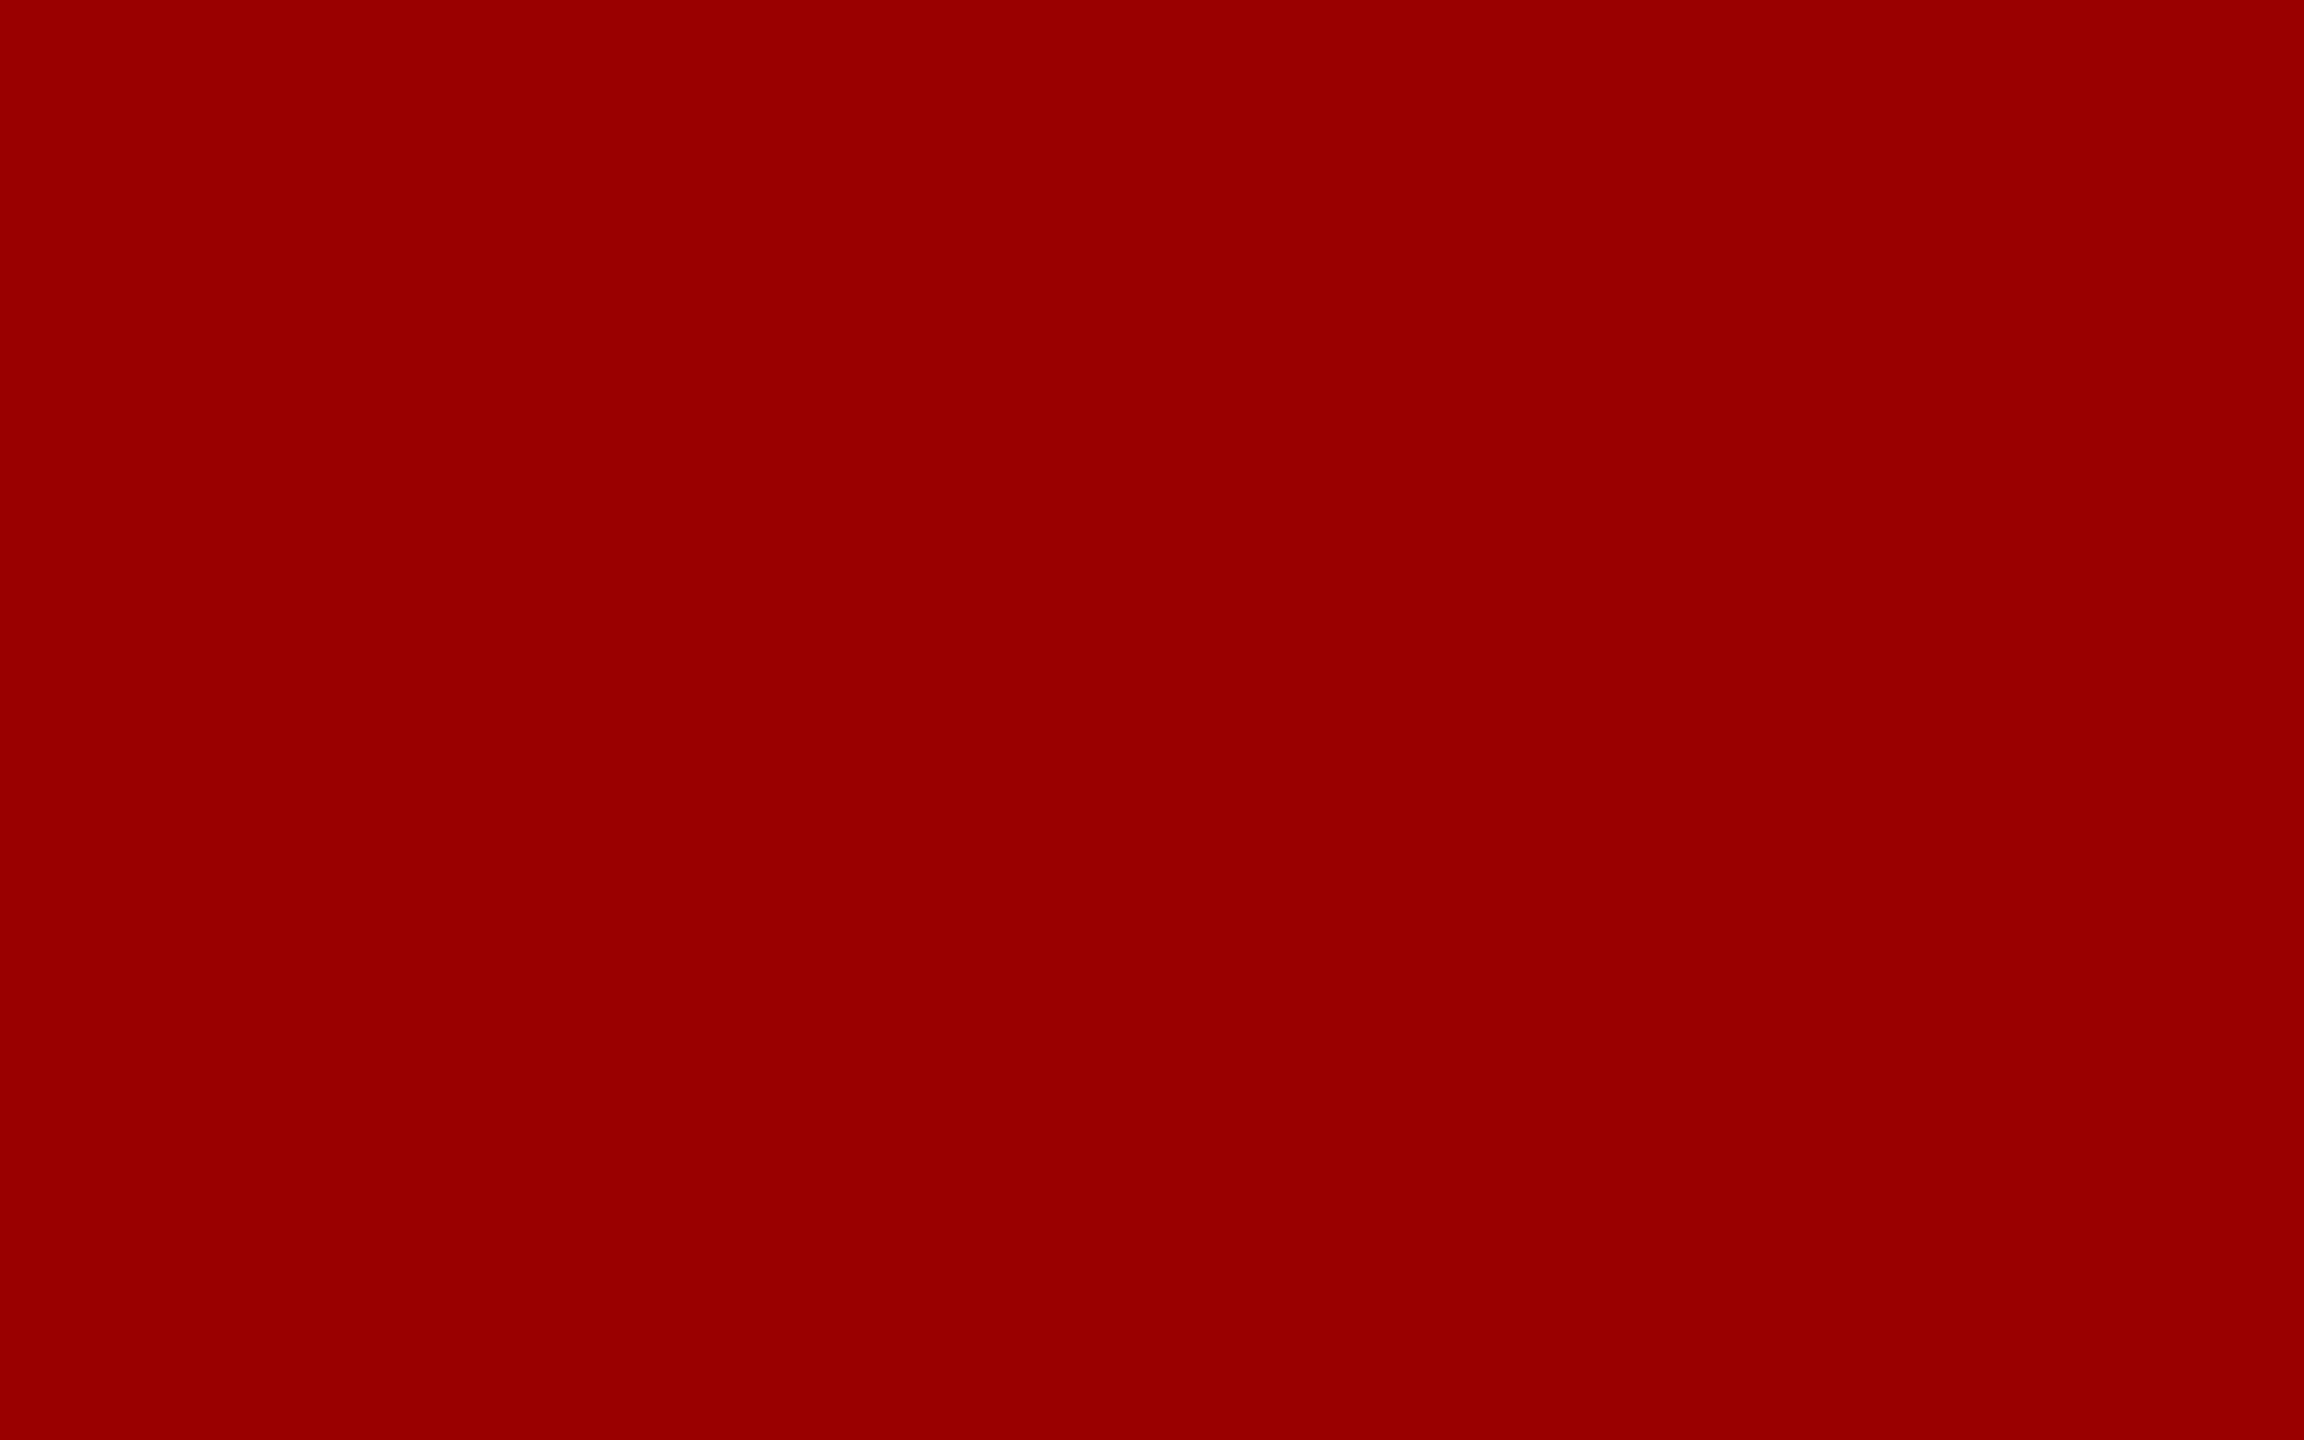 2304x1440 Stizza Solid Color Background